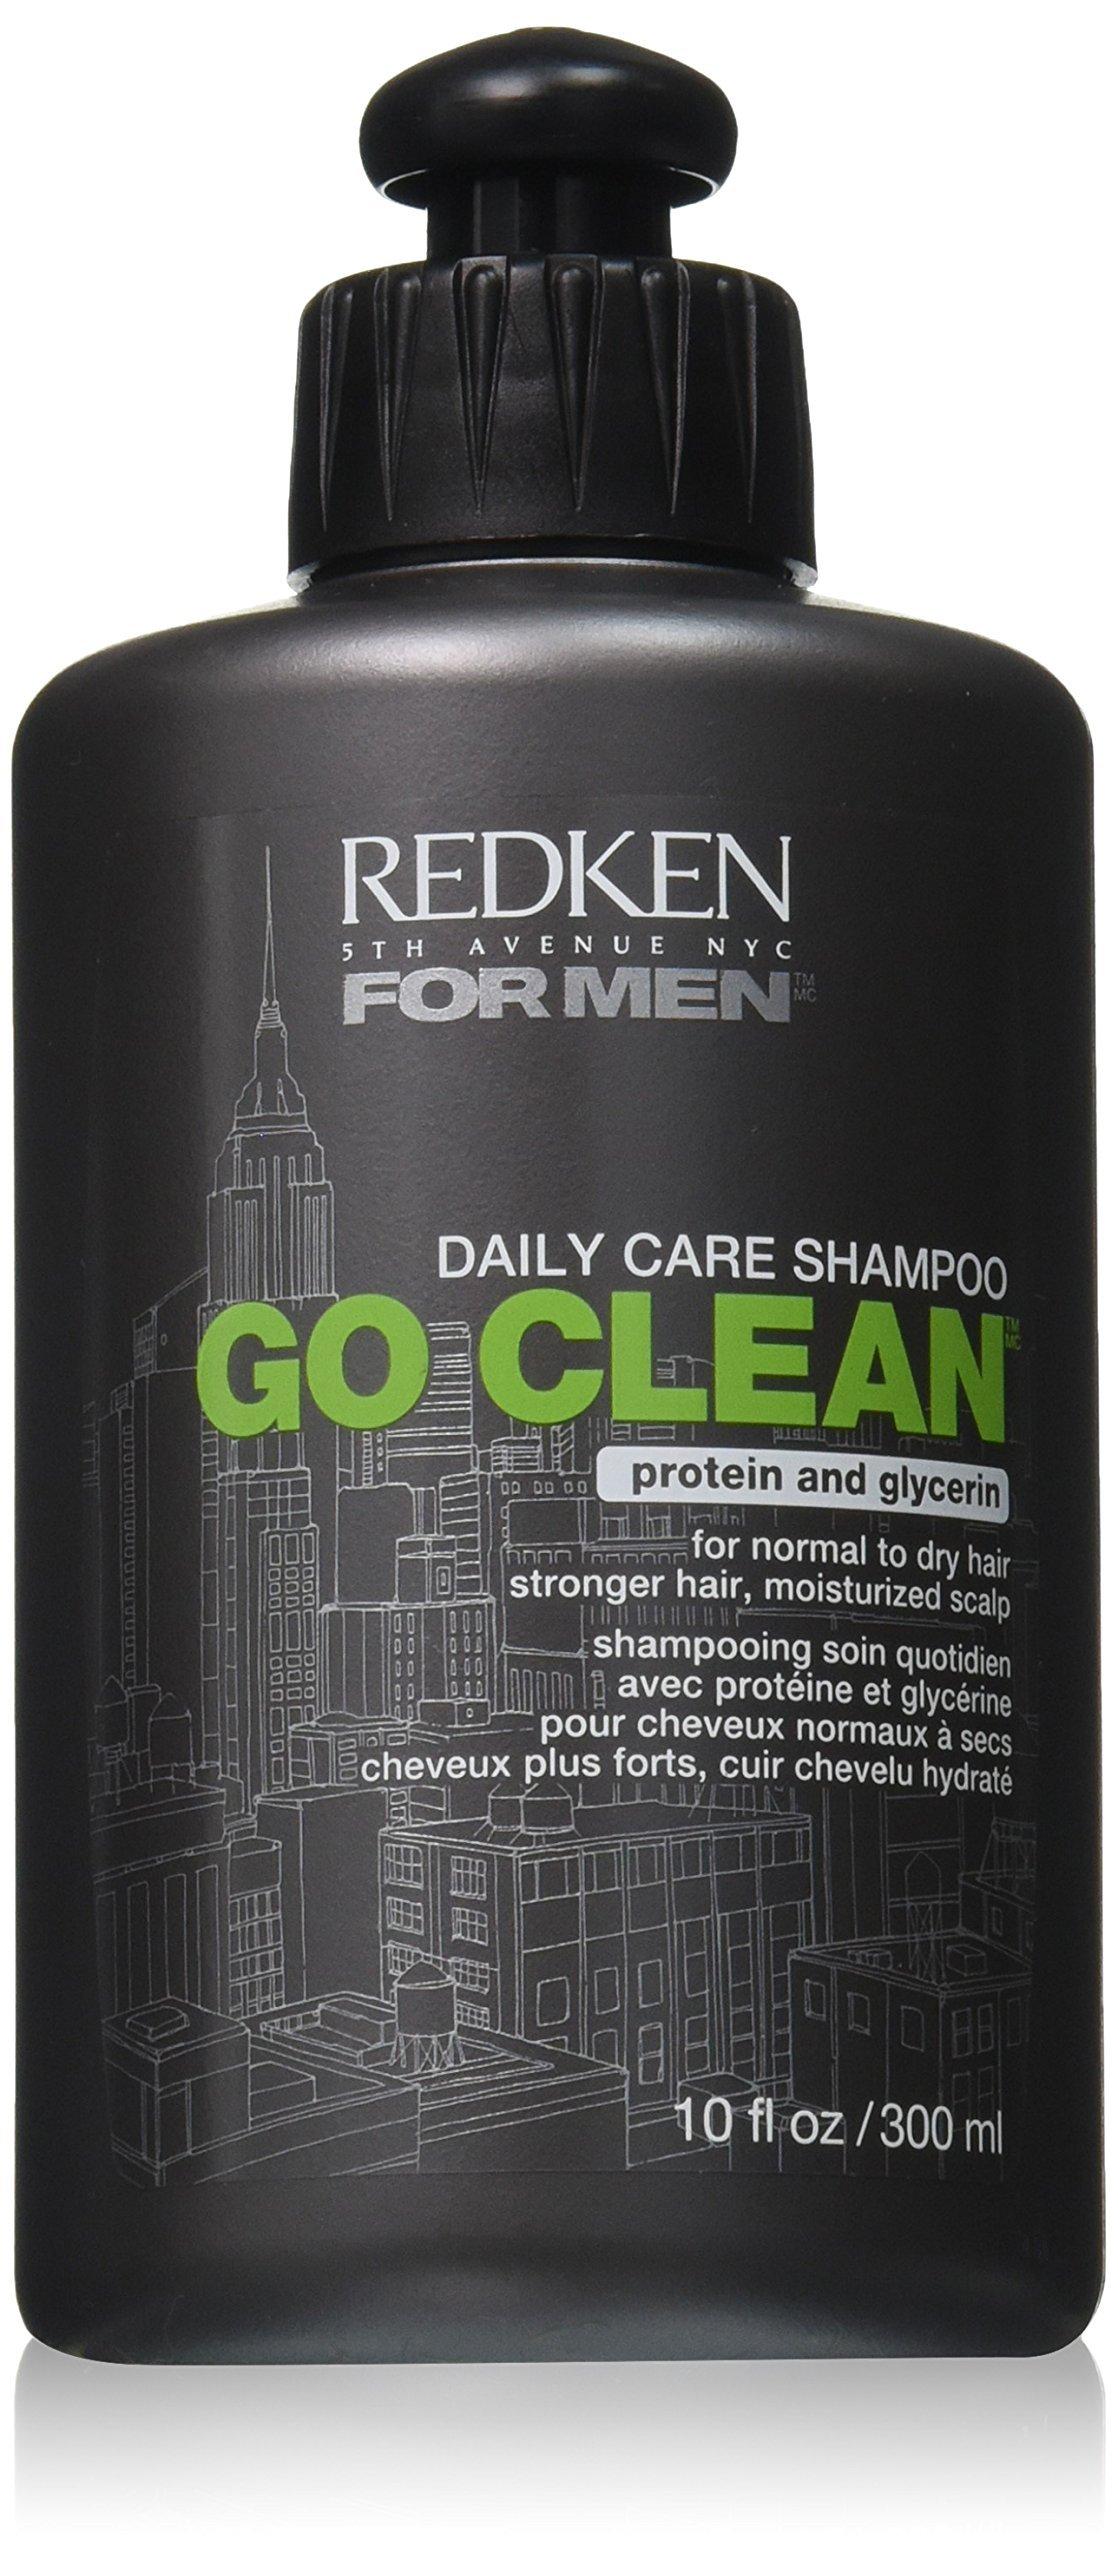 Redken Men Go Clean Shampoo, 10 Fluid Ounce